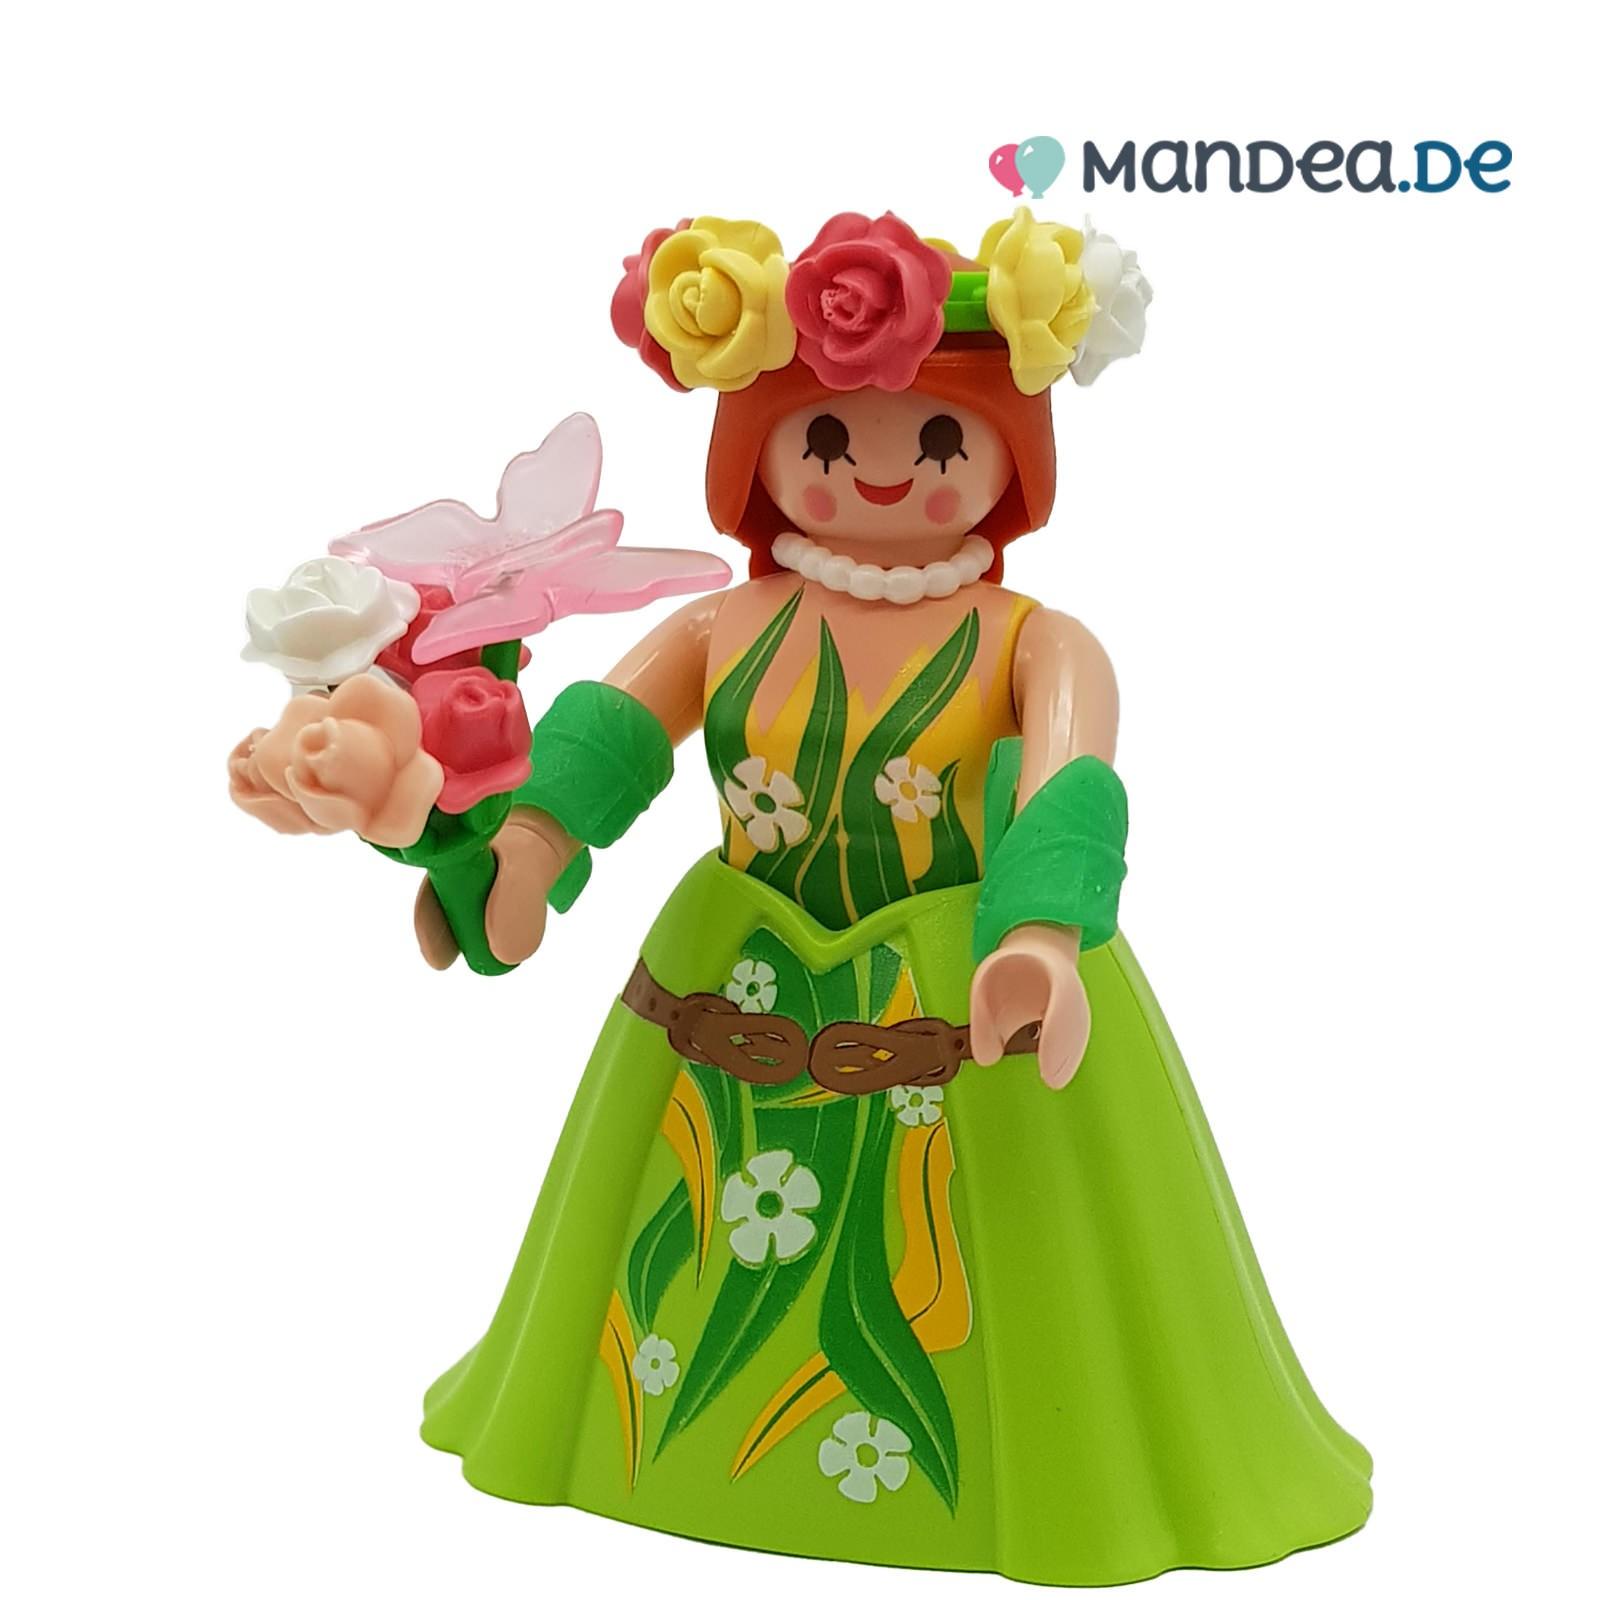 playmobil® figures serie 14 prinzessin k9444a  girls